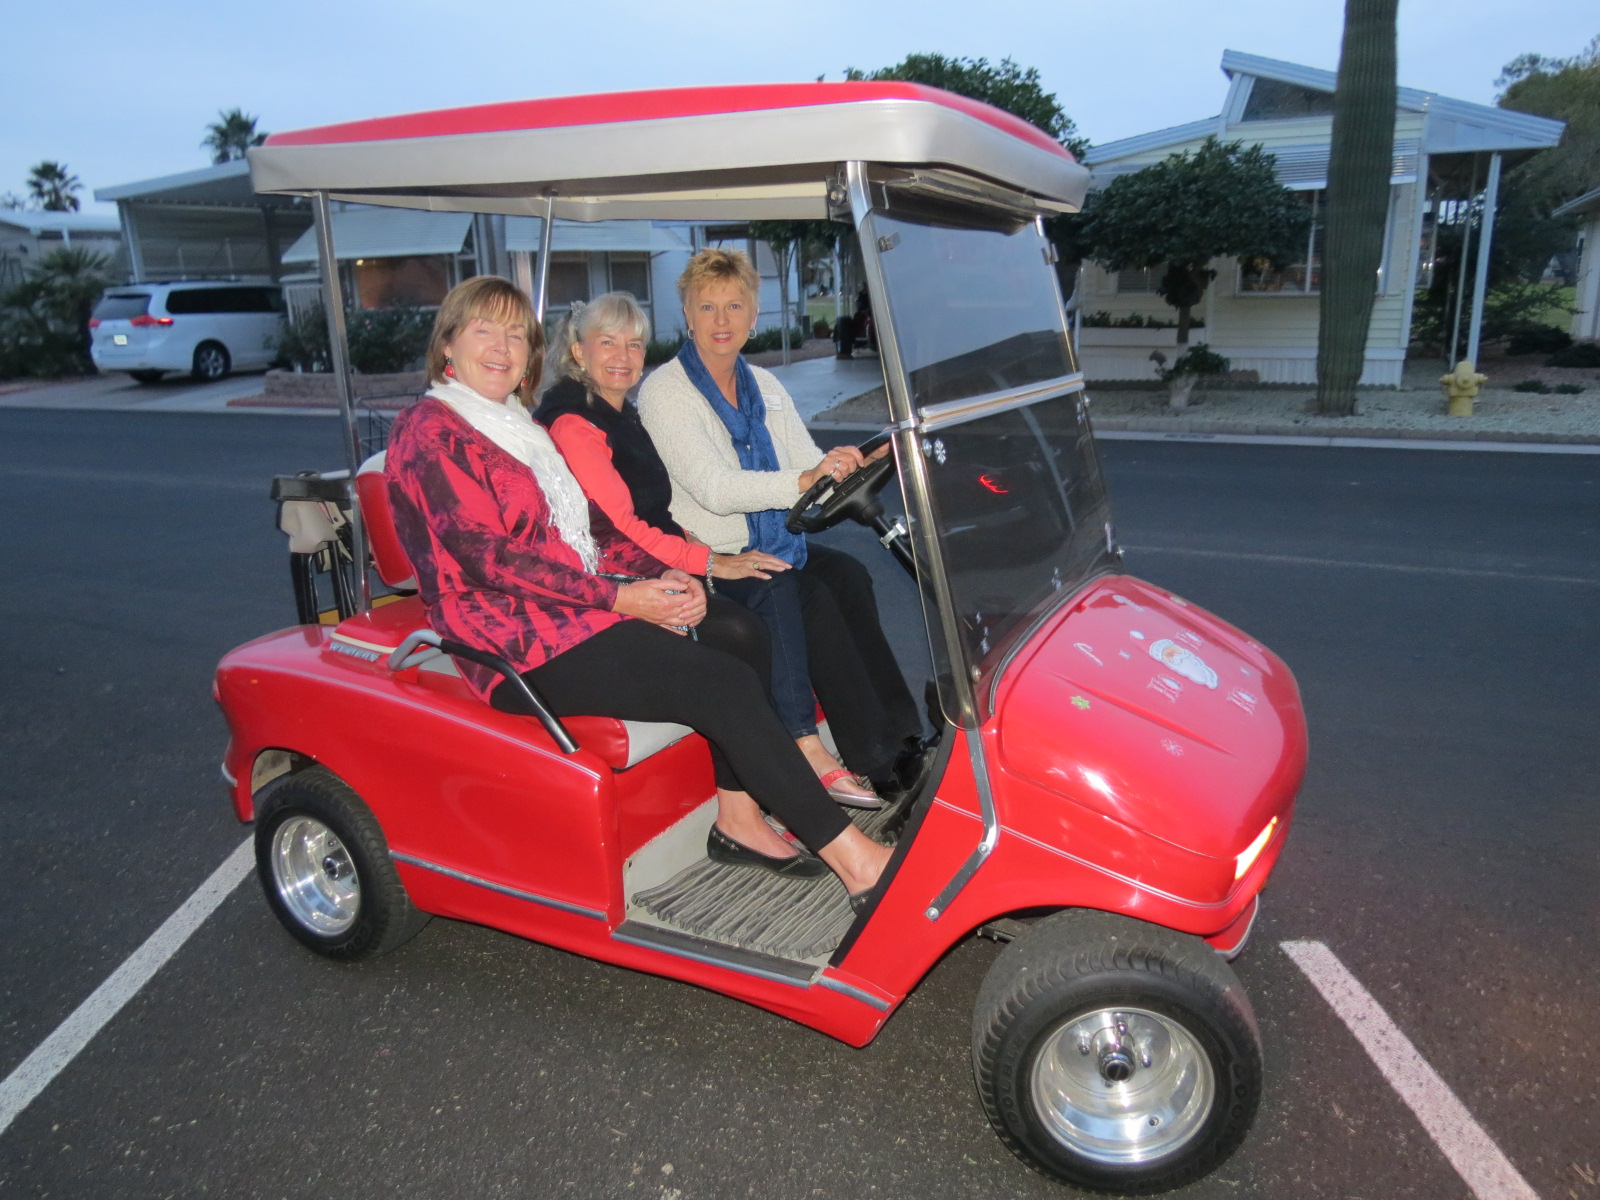 Karen, Jossie & Carol going to Christmas Lighting Event